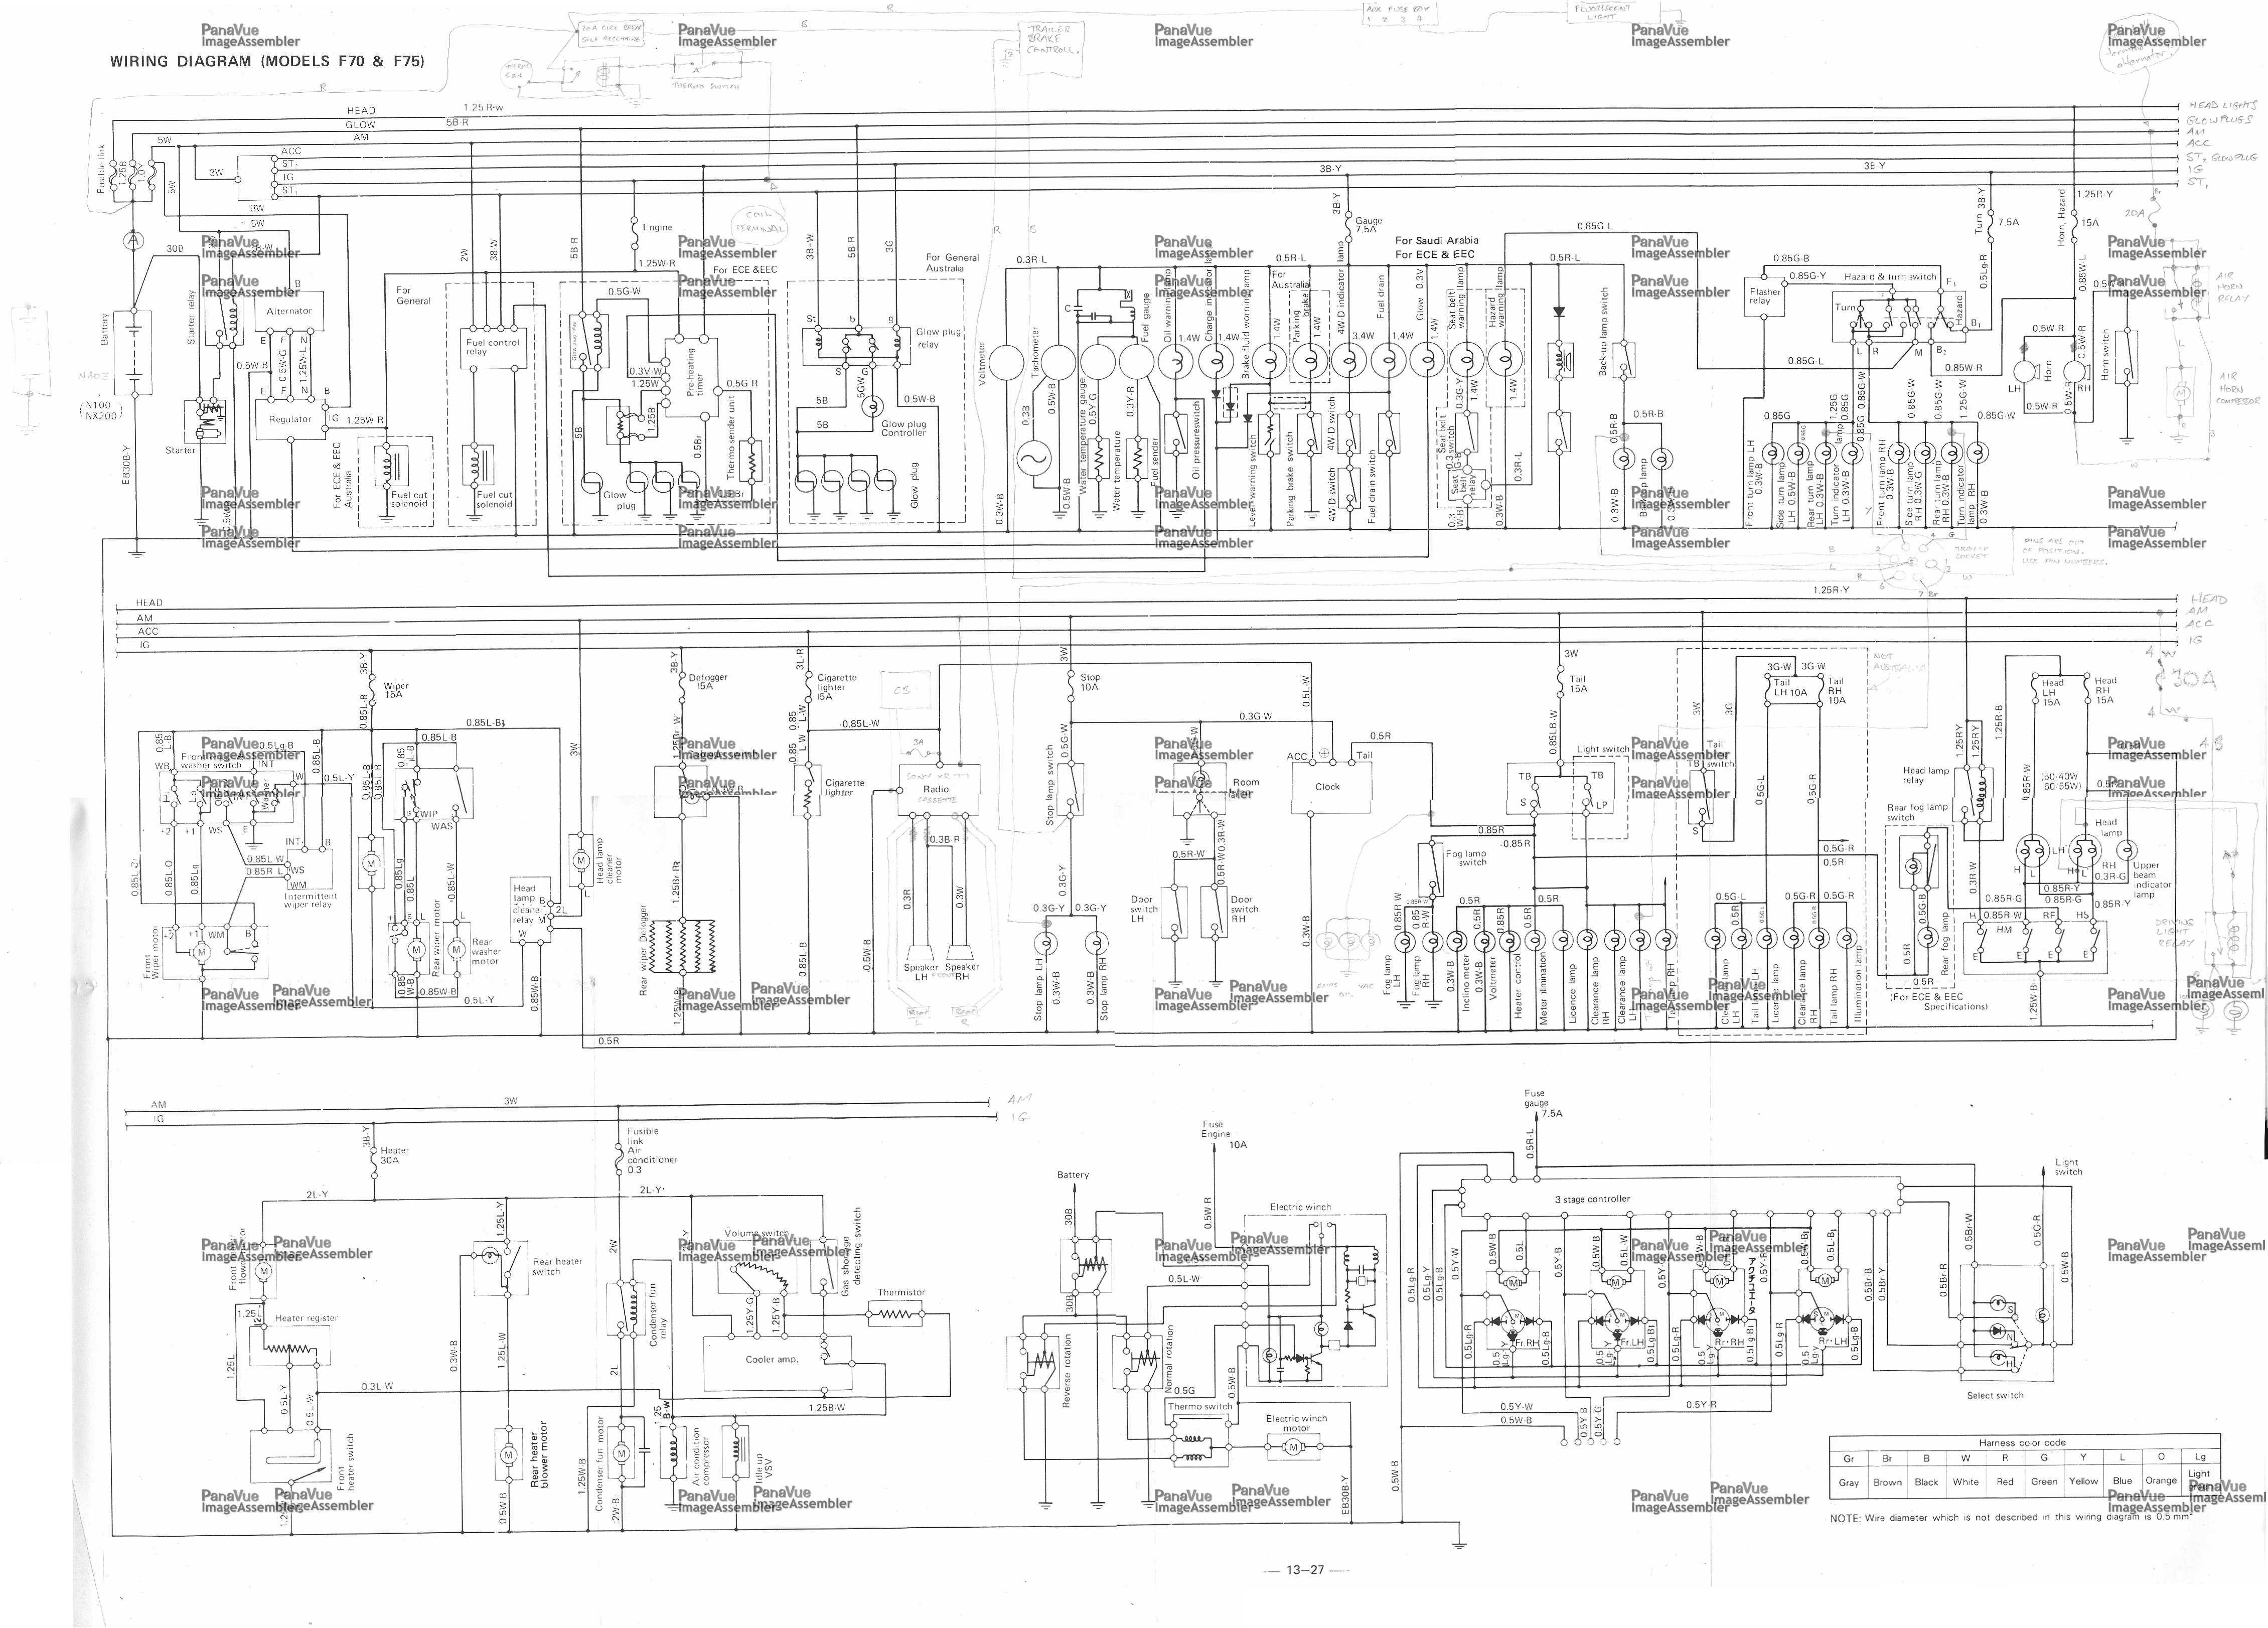 100 [ 2005 daihatsu cuore service manual ] used cars for sale daihatsu error code 51 daihatsu cuore wiring diagram